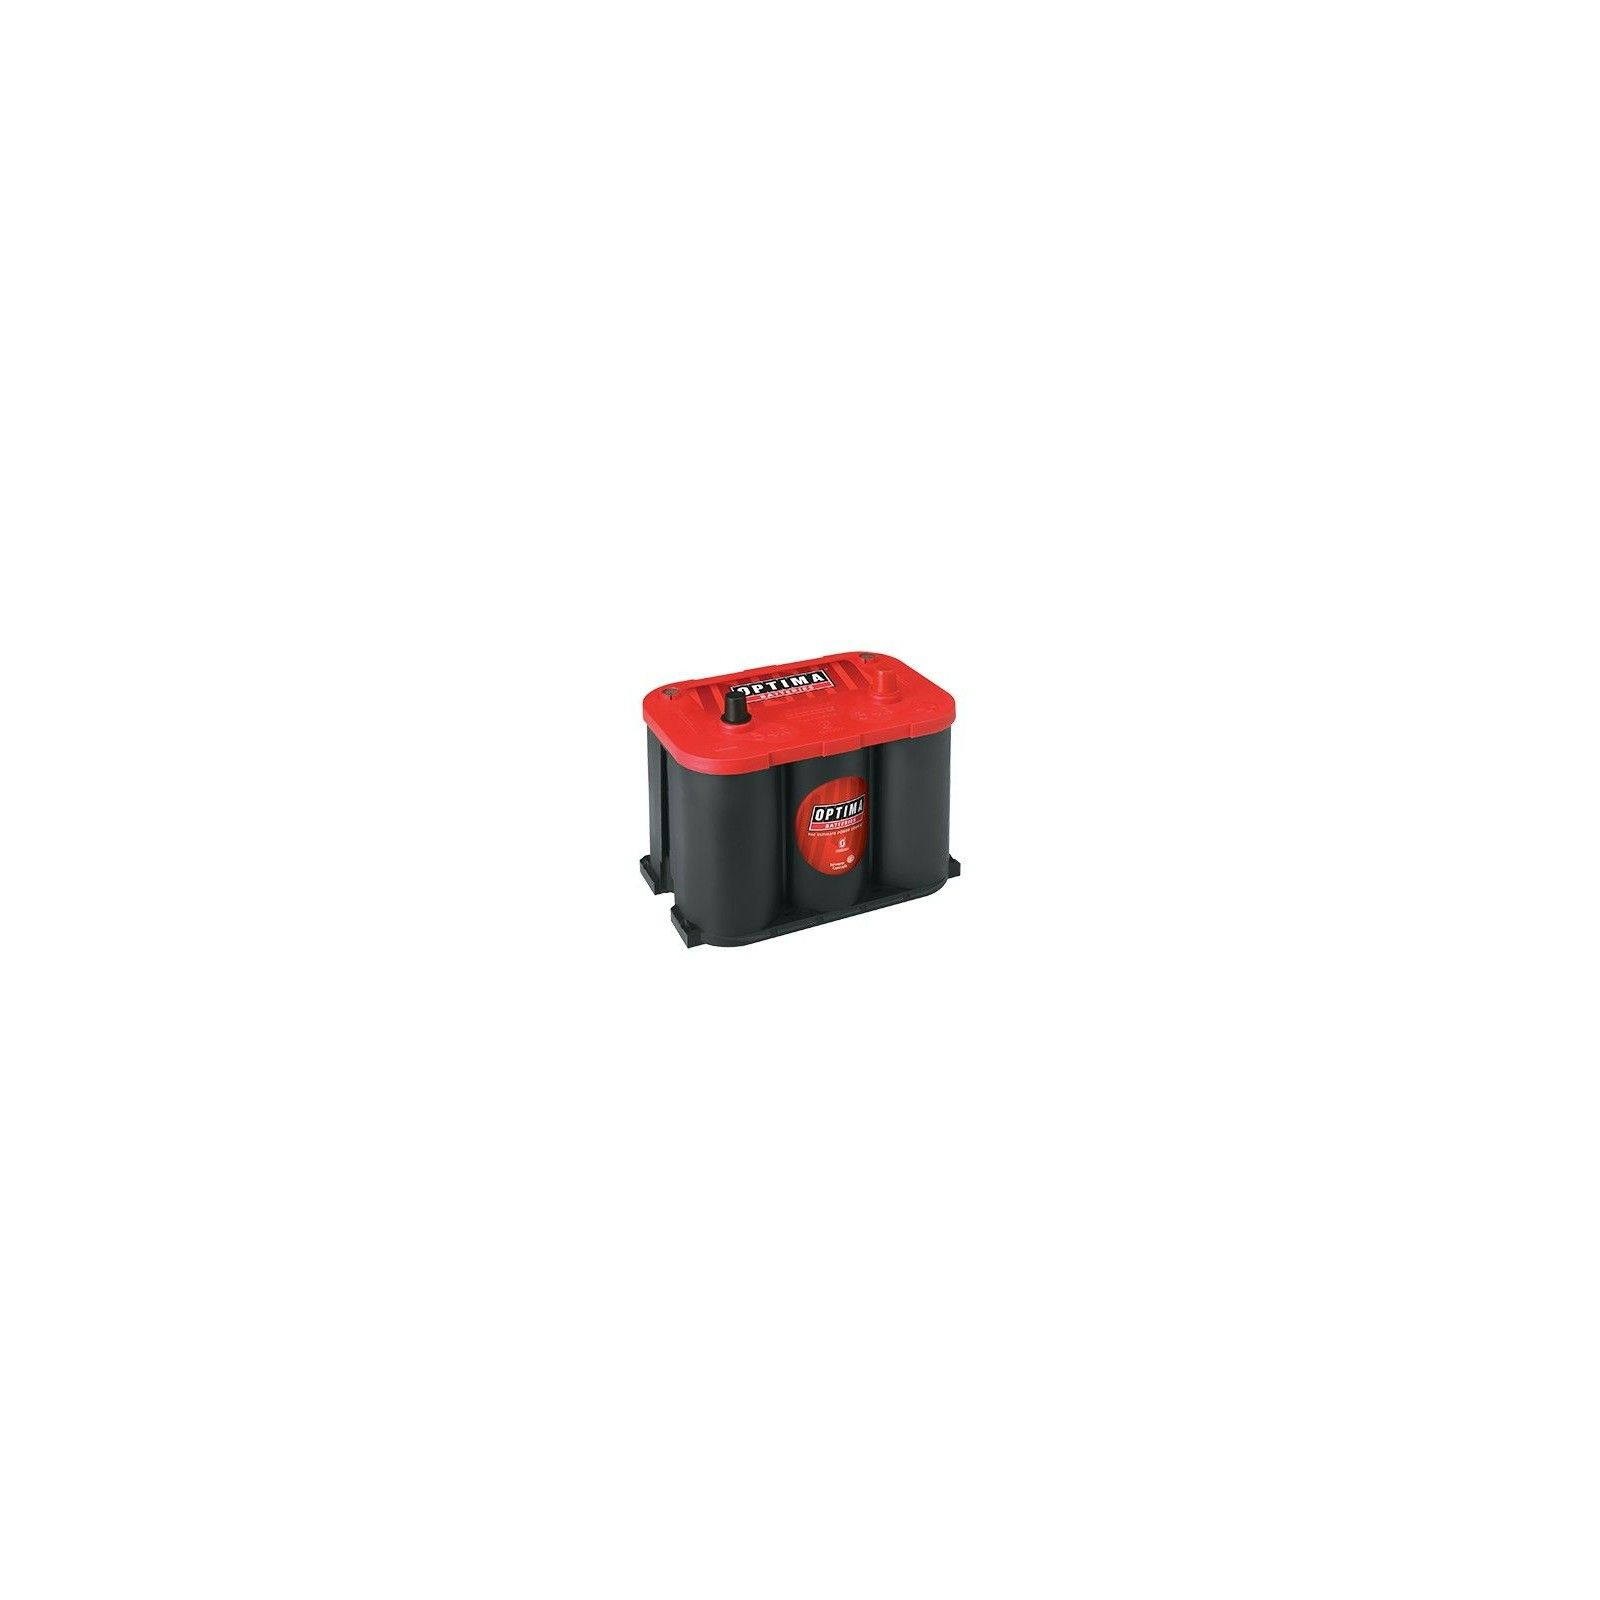 Batería Optima RTR-4.2 50Ah 815A 12V Red Top OPTIMA - 1